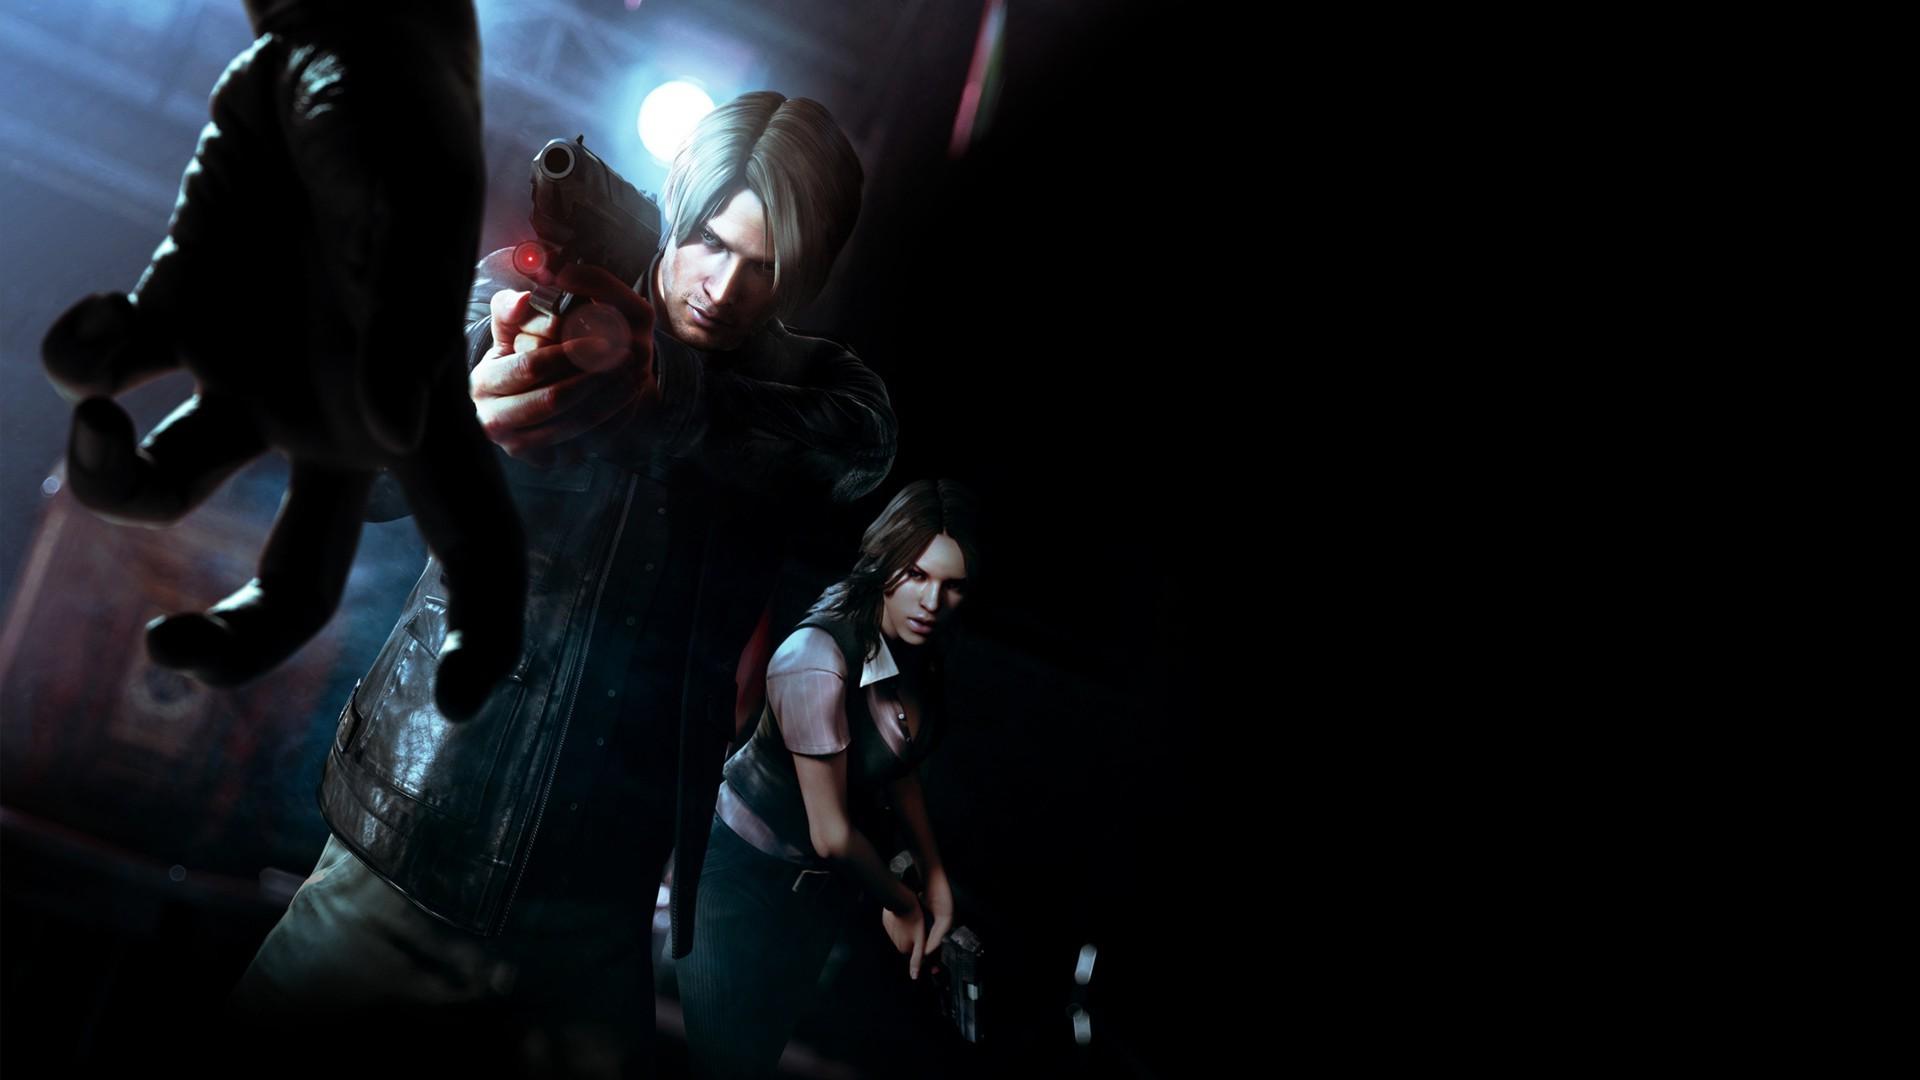 Wallpaper Gun Video Games Black Background Resident